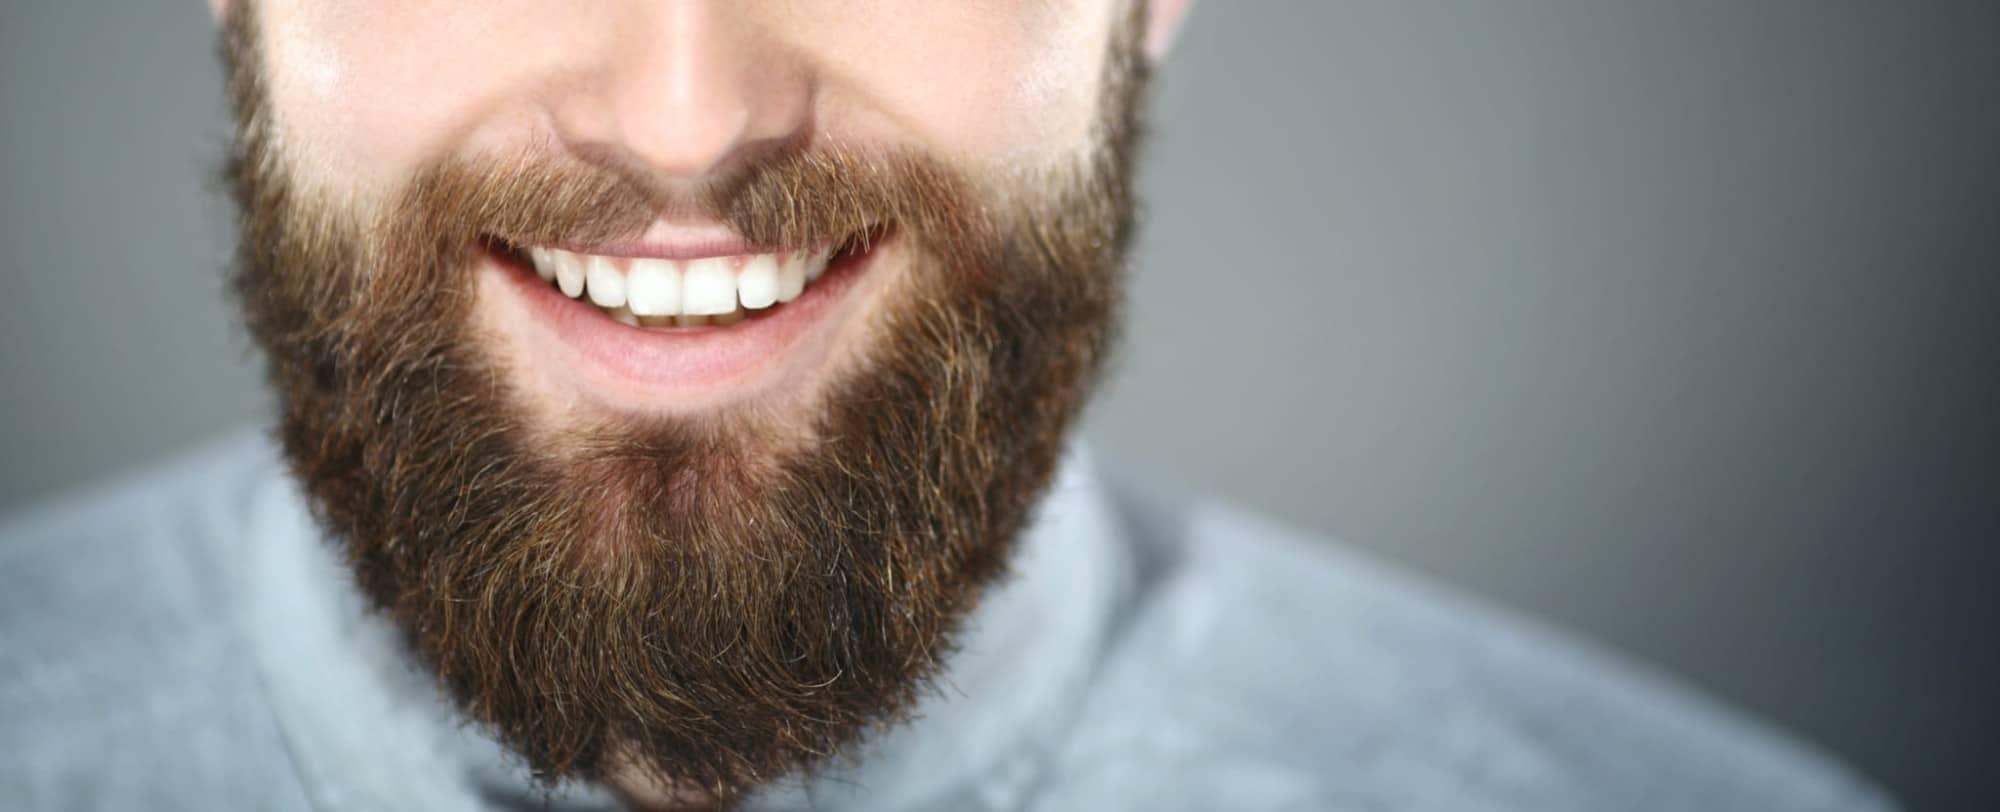 Beard Transplant La Jolla, CA